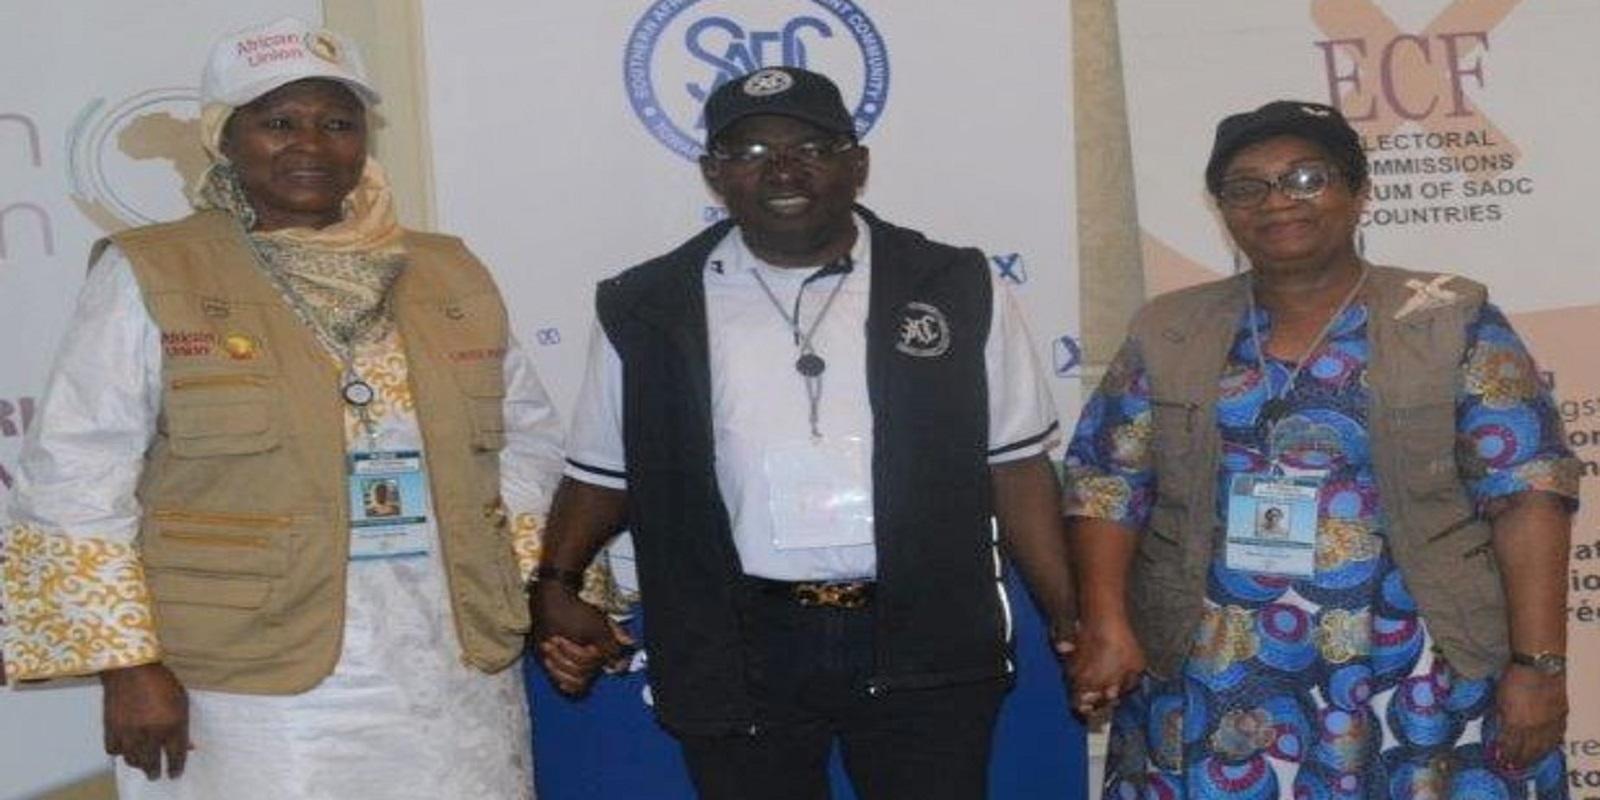 SADC-EFCA